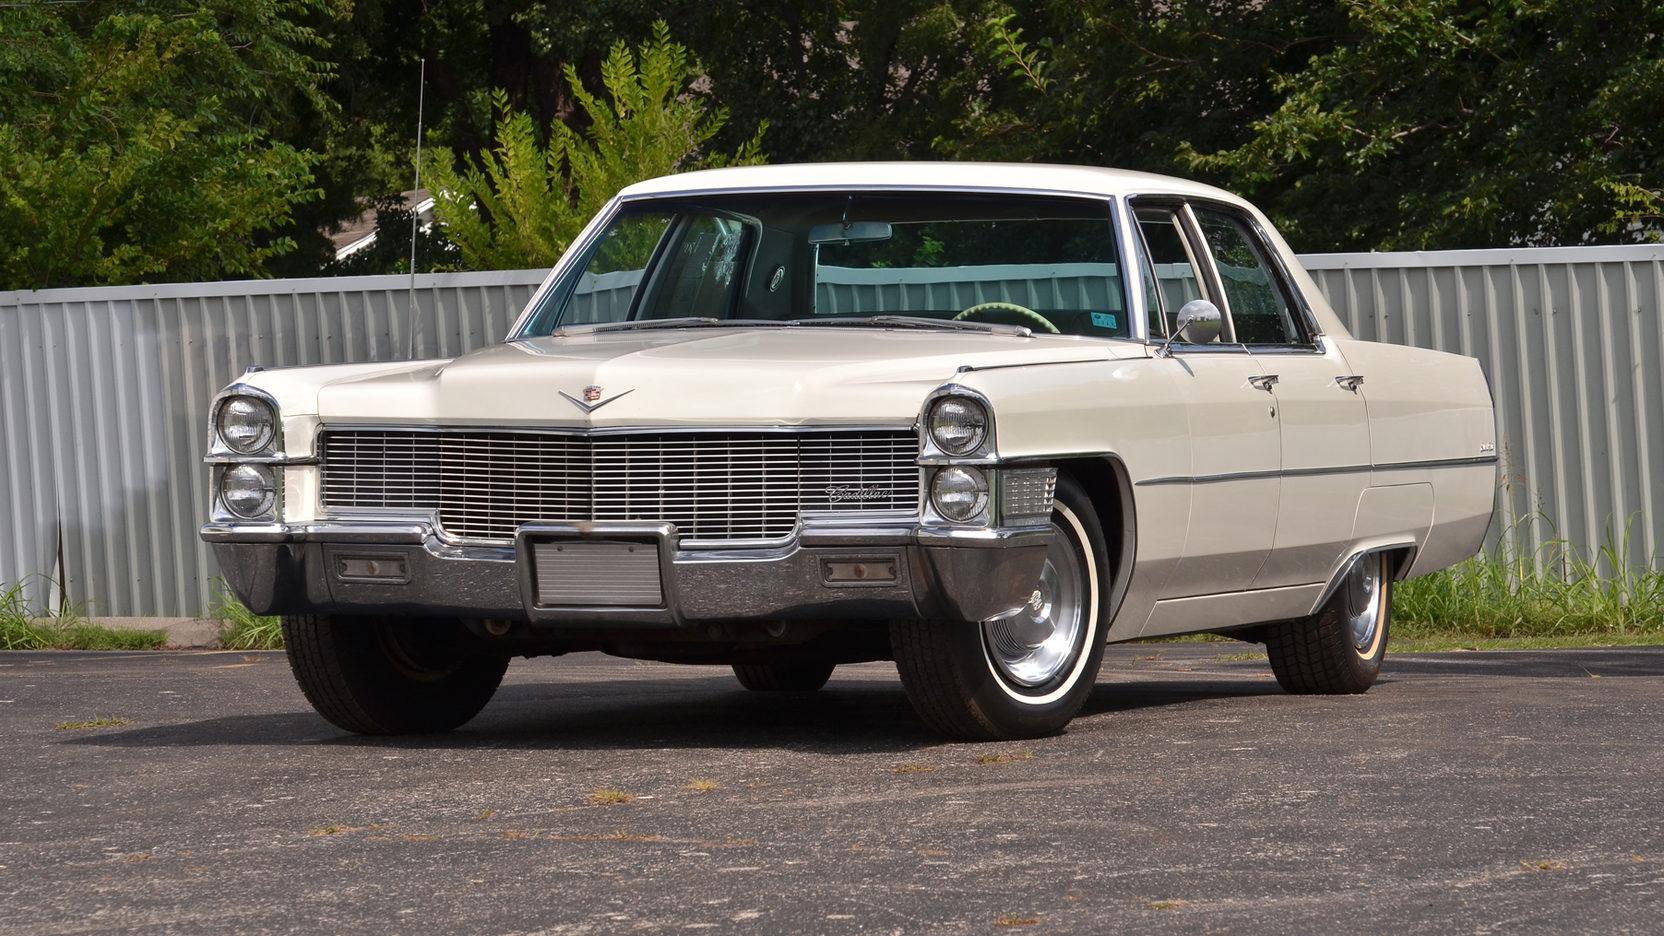 1965 Cadillac Sedan DeVille white front 3/4